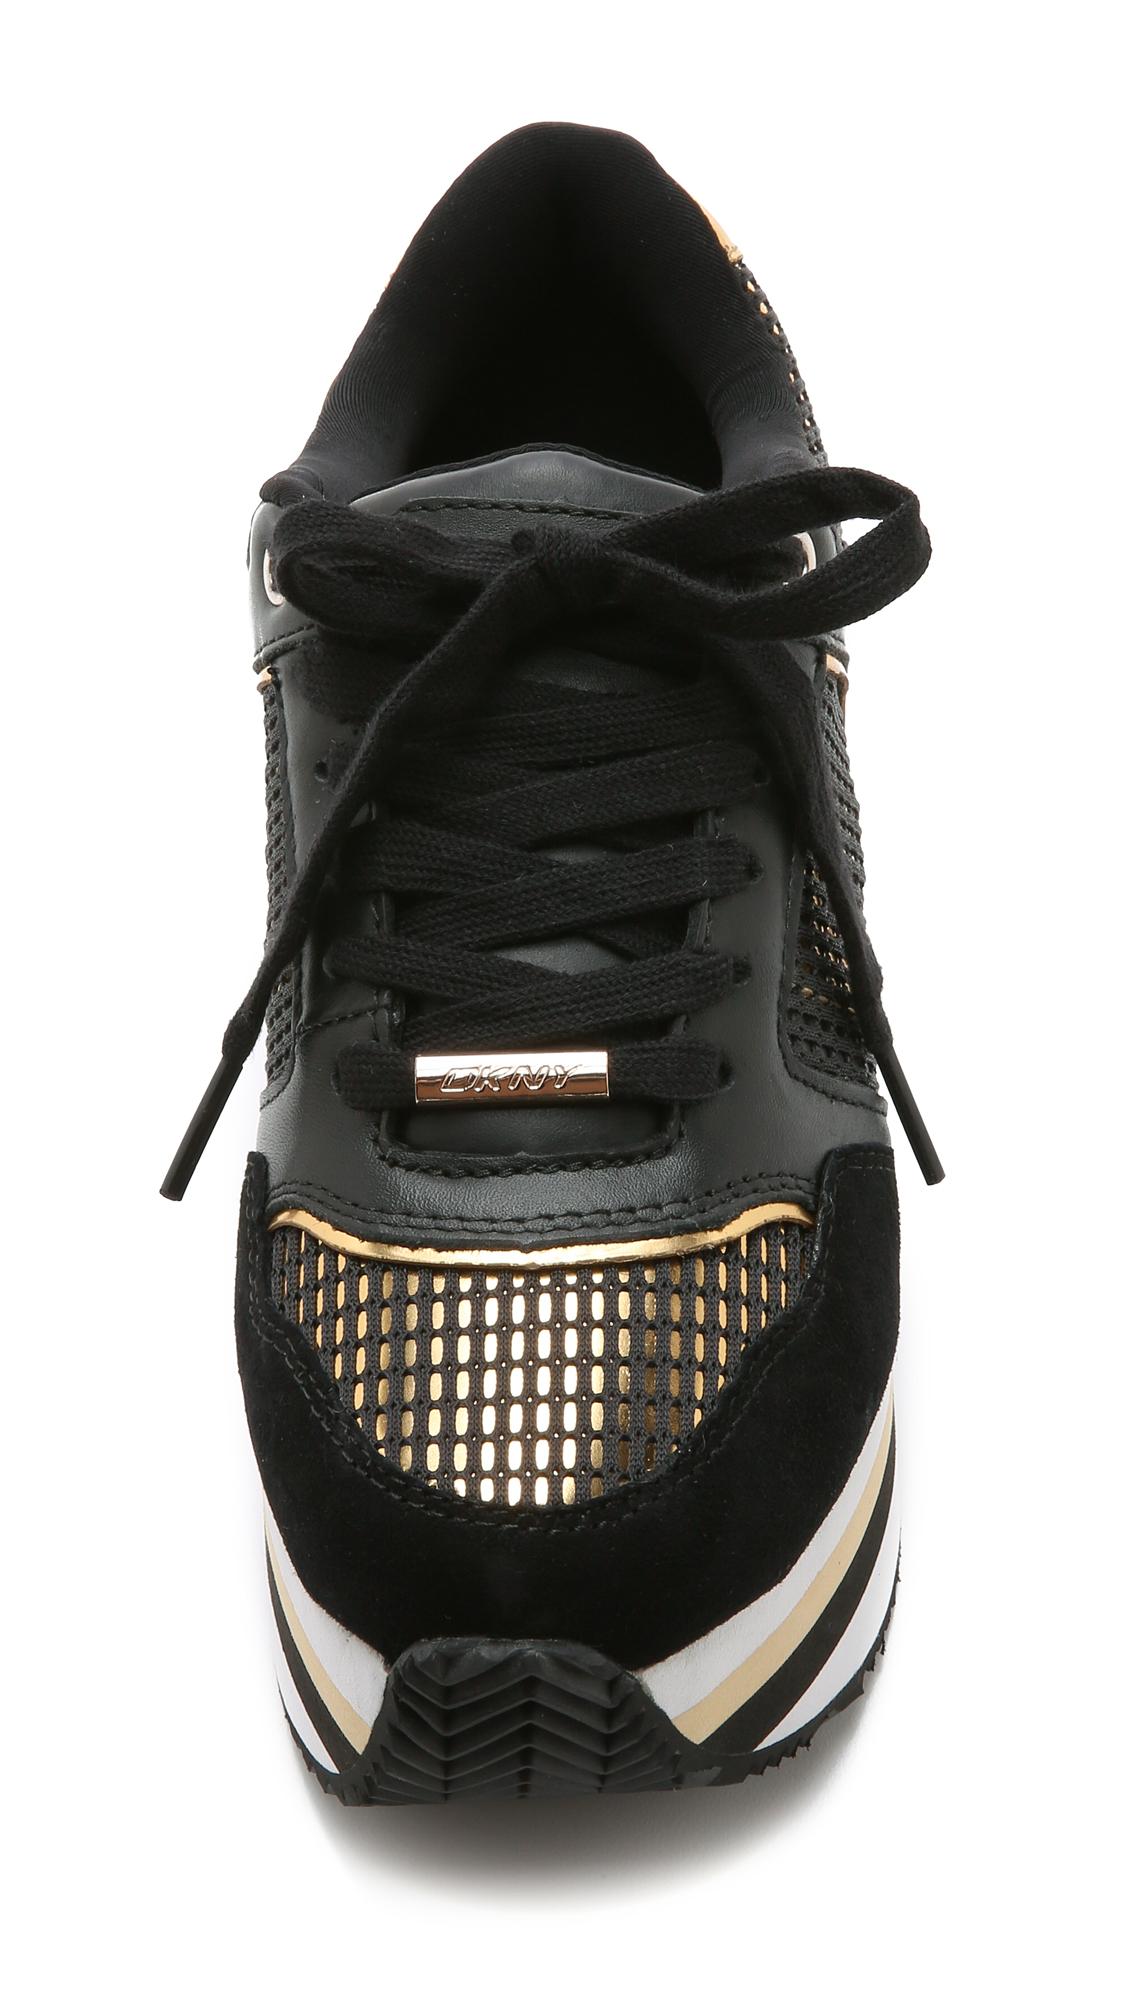 65c921dbb93 DKNY Jill Runway Platform Sneakers